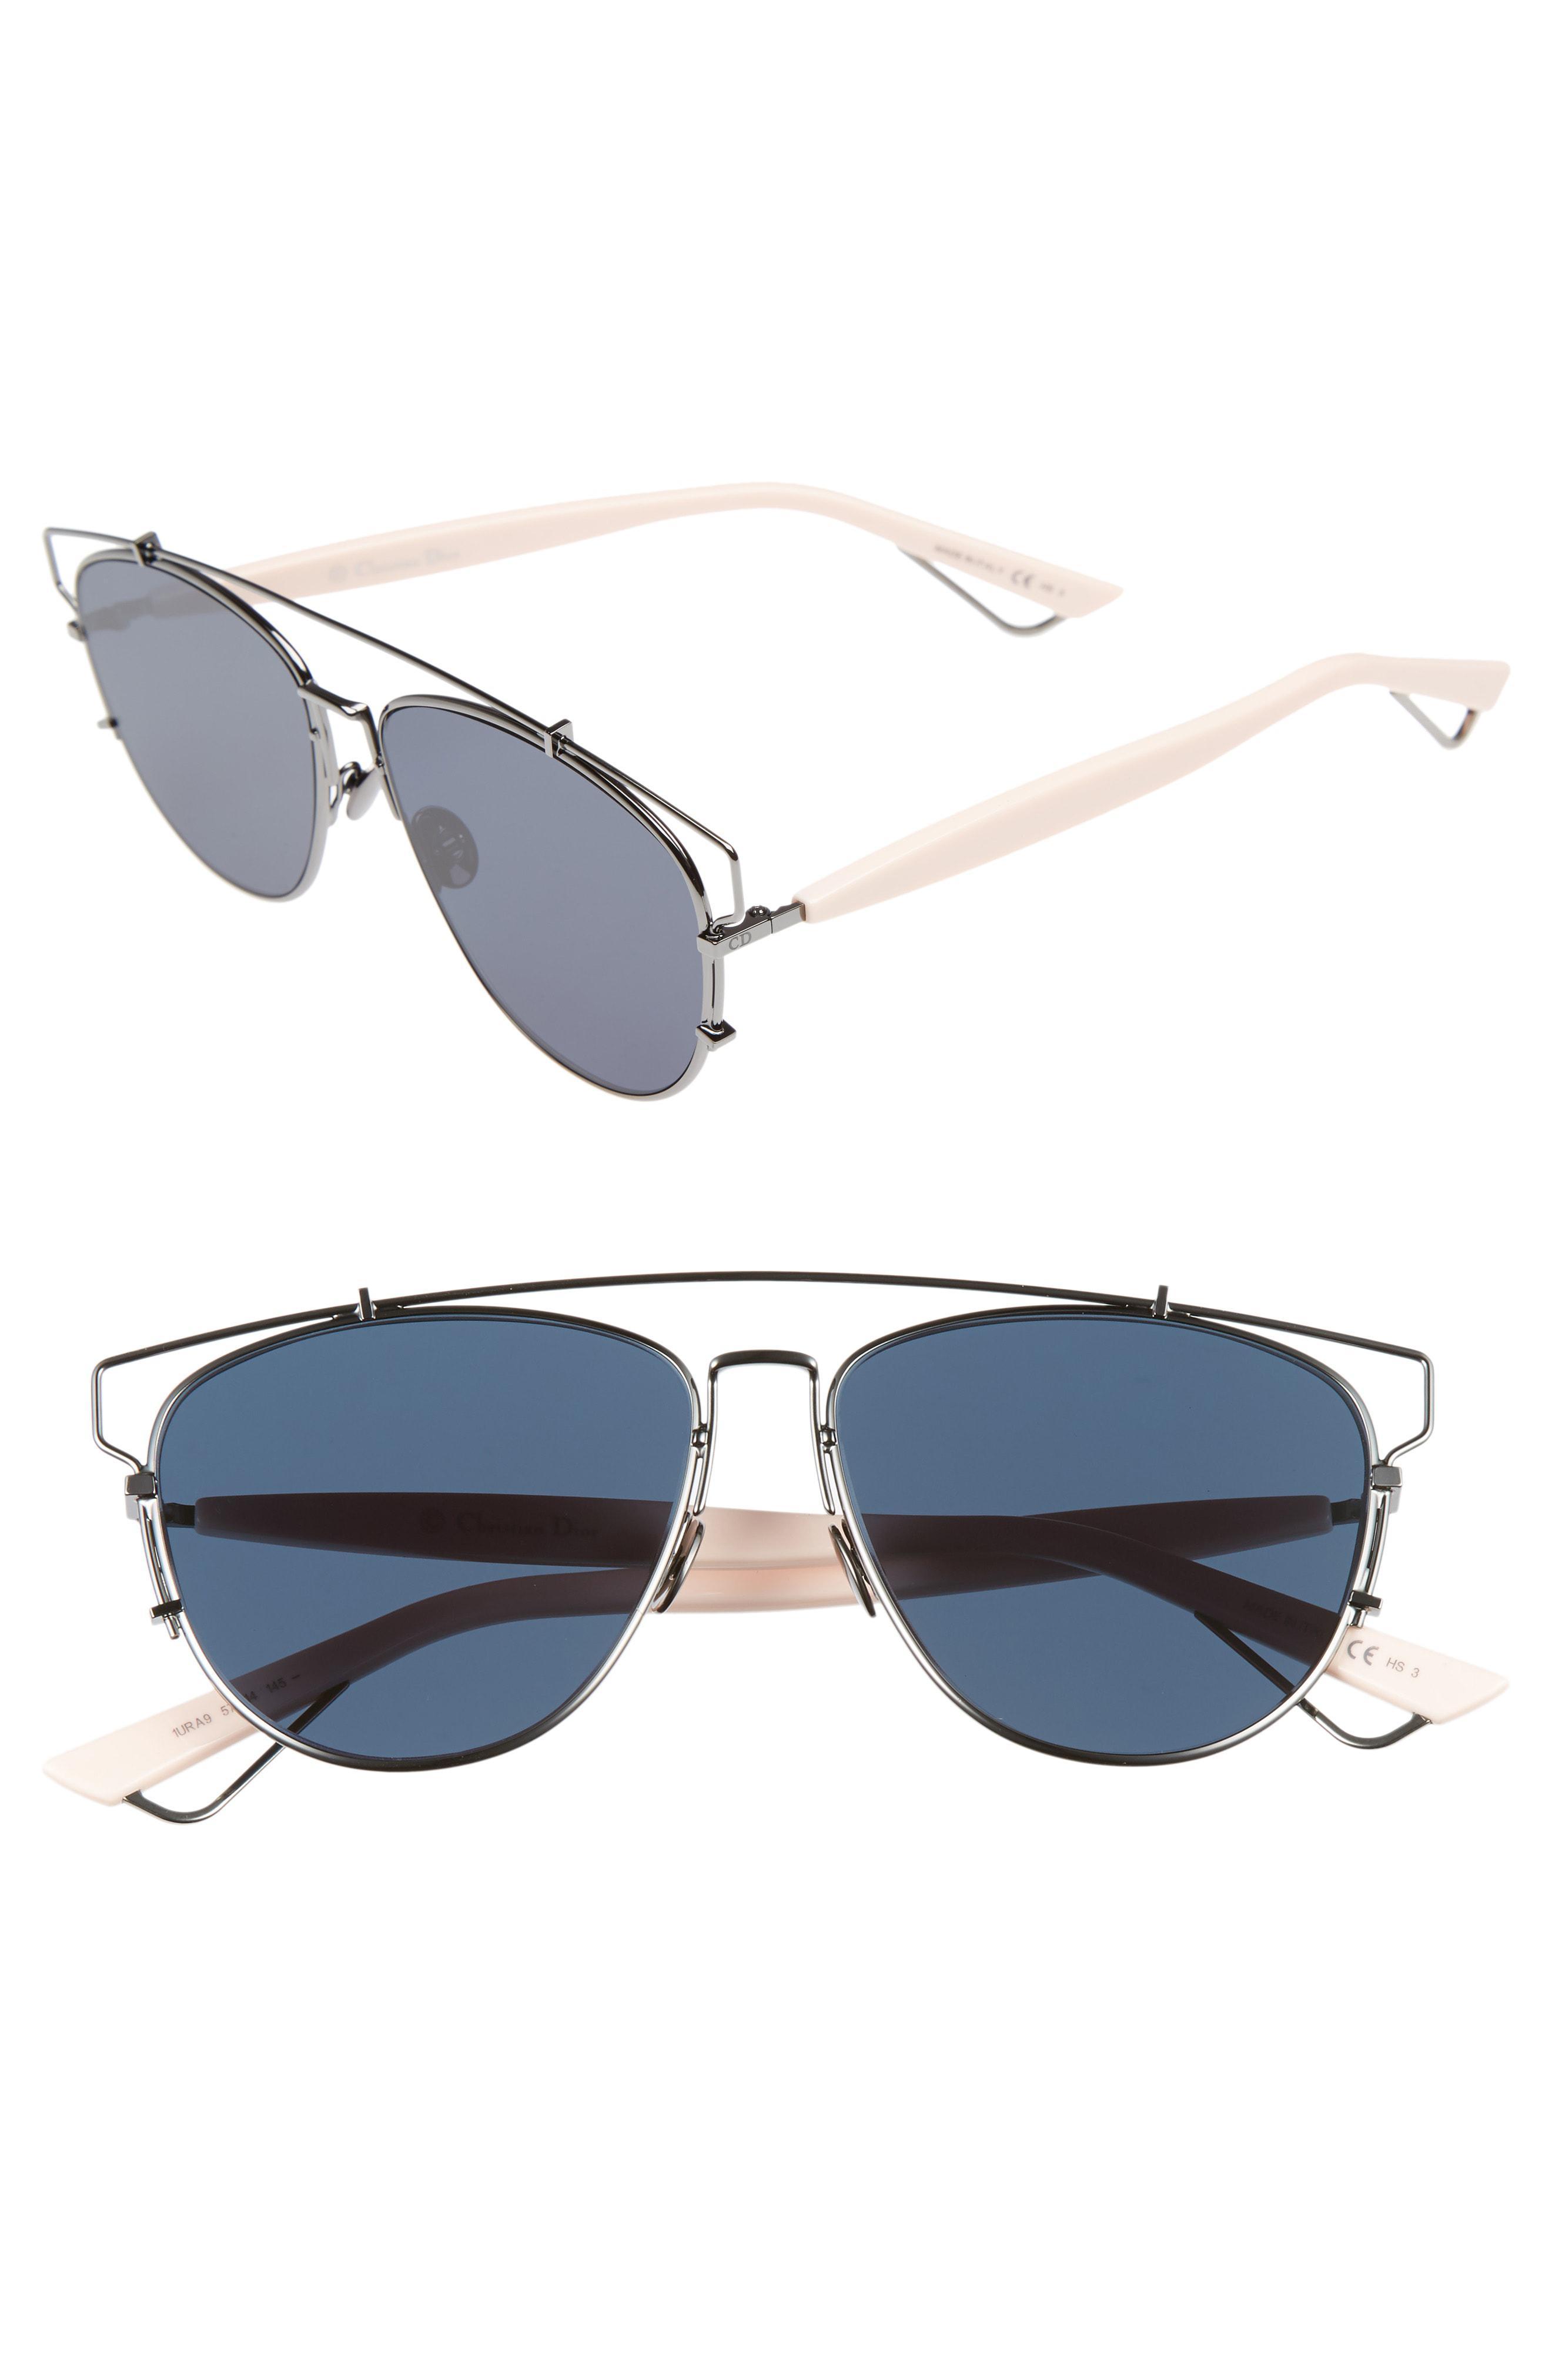 ecce2b29b8fb Lyst - Dior Technologic 57mm Brow Bar Sunglasses - Dark Ruthenium ...